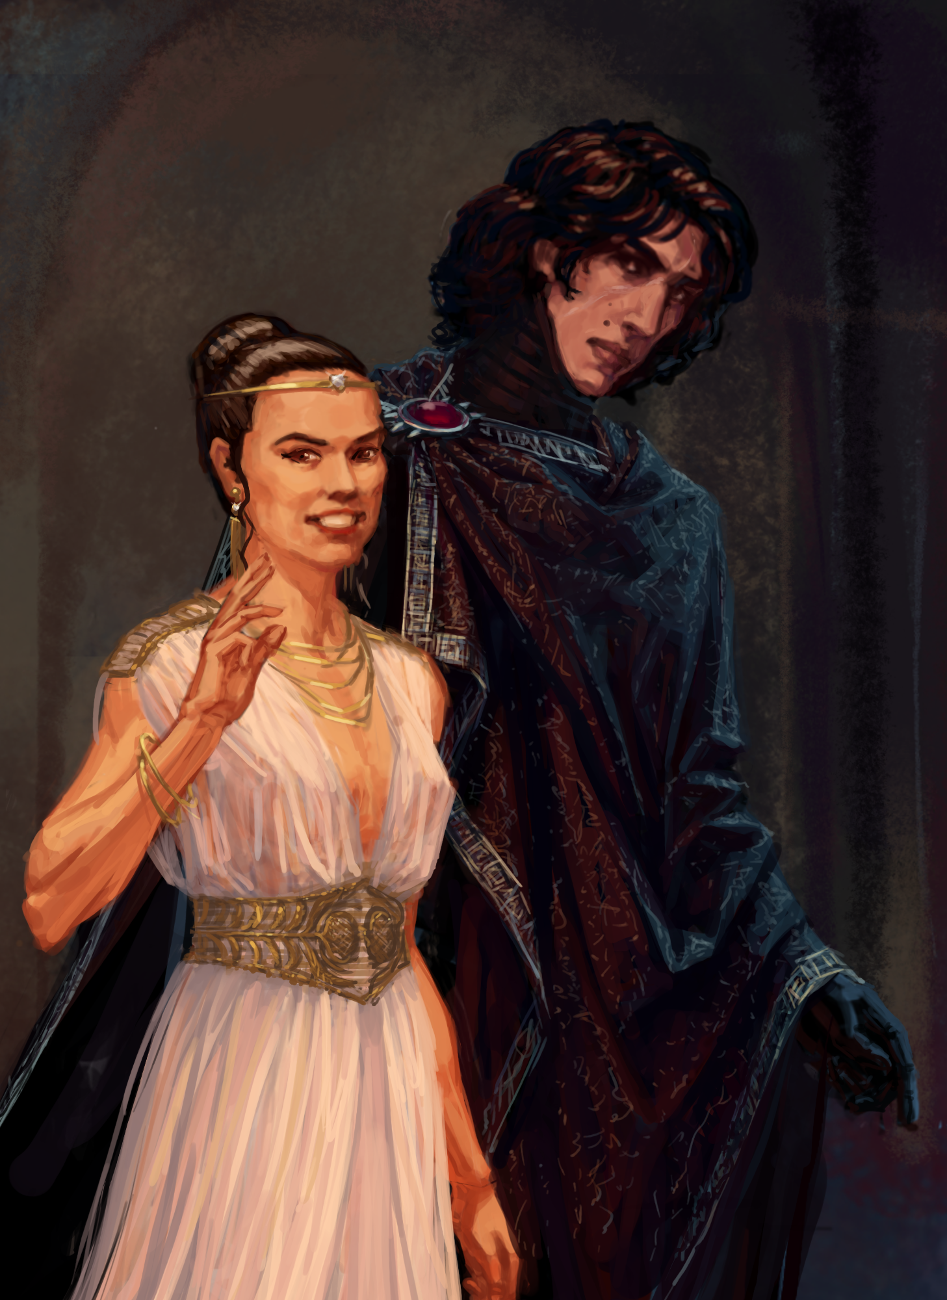 Imperial Reylo by LynxC